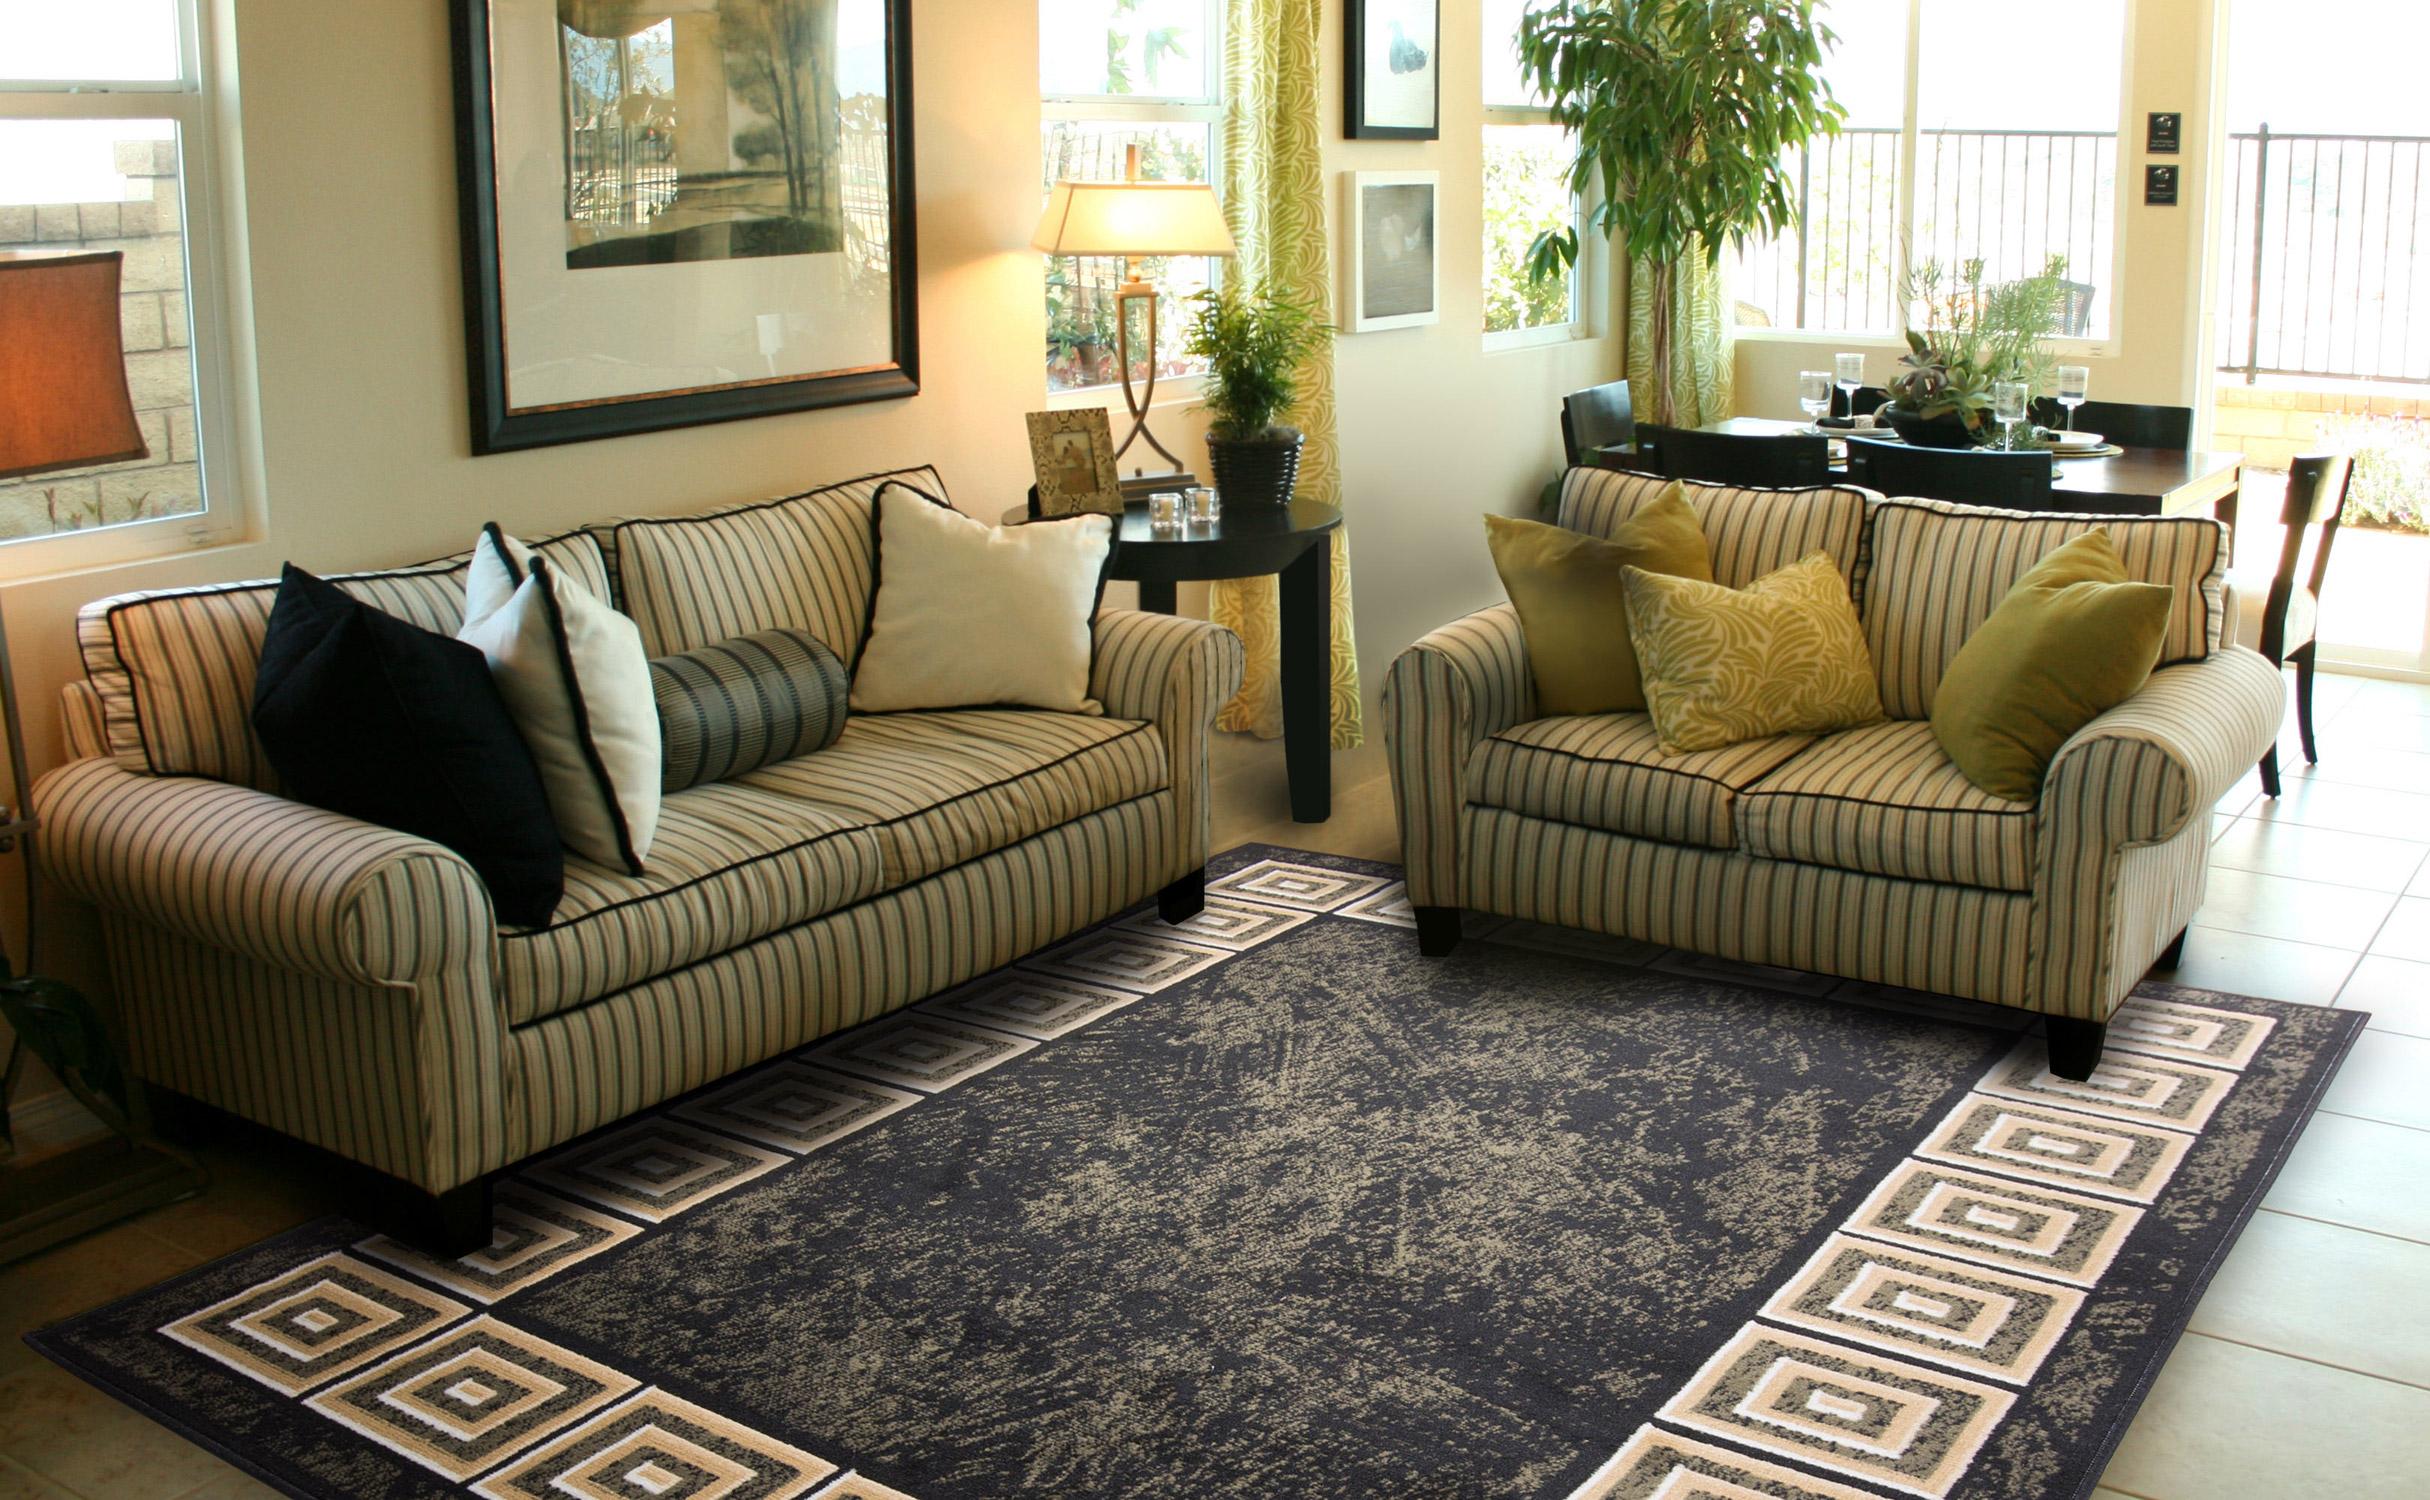 rug decor rugs-area-rugs-carpet-flooring-area-rug-floor- PJUFXUL